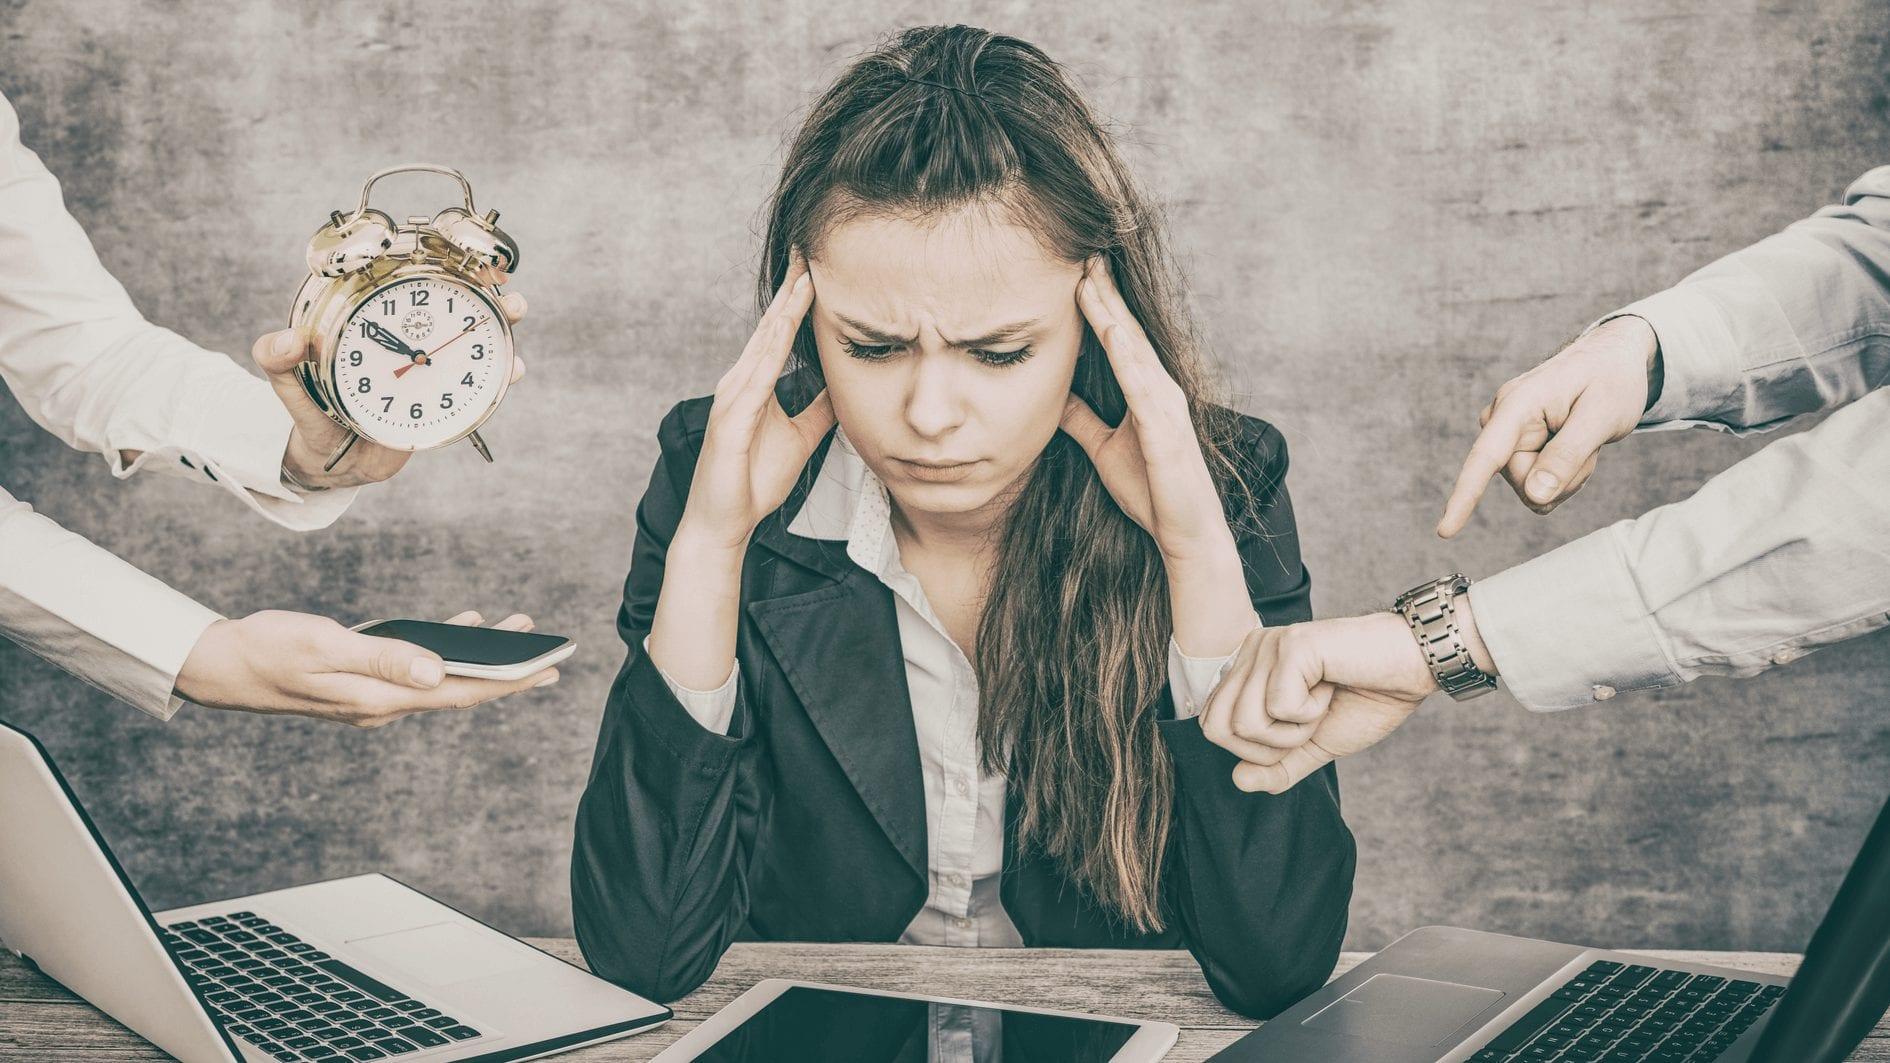 WFH Lebih Lelah dan Capek? Berikut Cara Mengatasi Kelelahan!